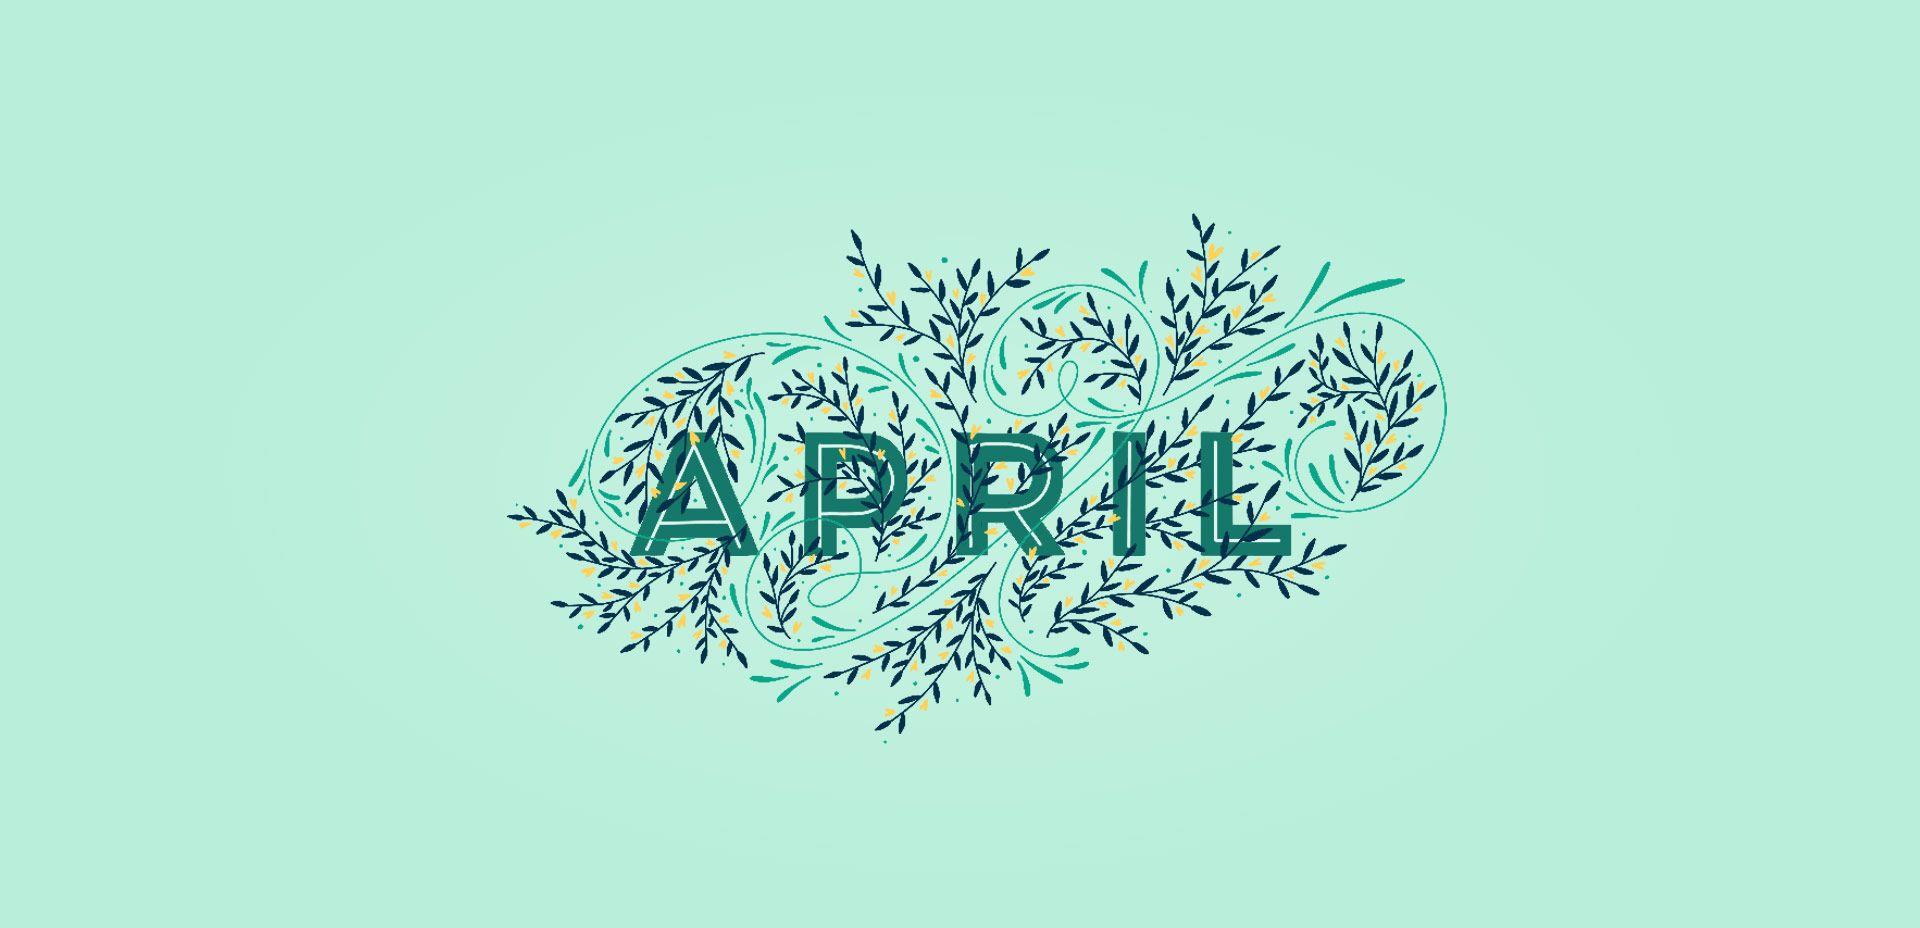 April Desktop Wallpapers   Top April Desktop Backgrounds 1920x928